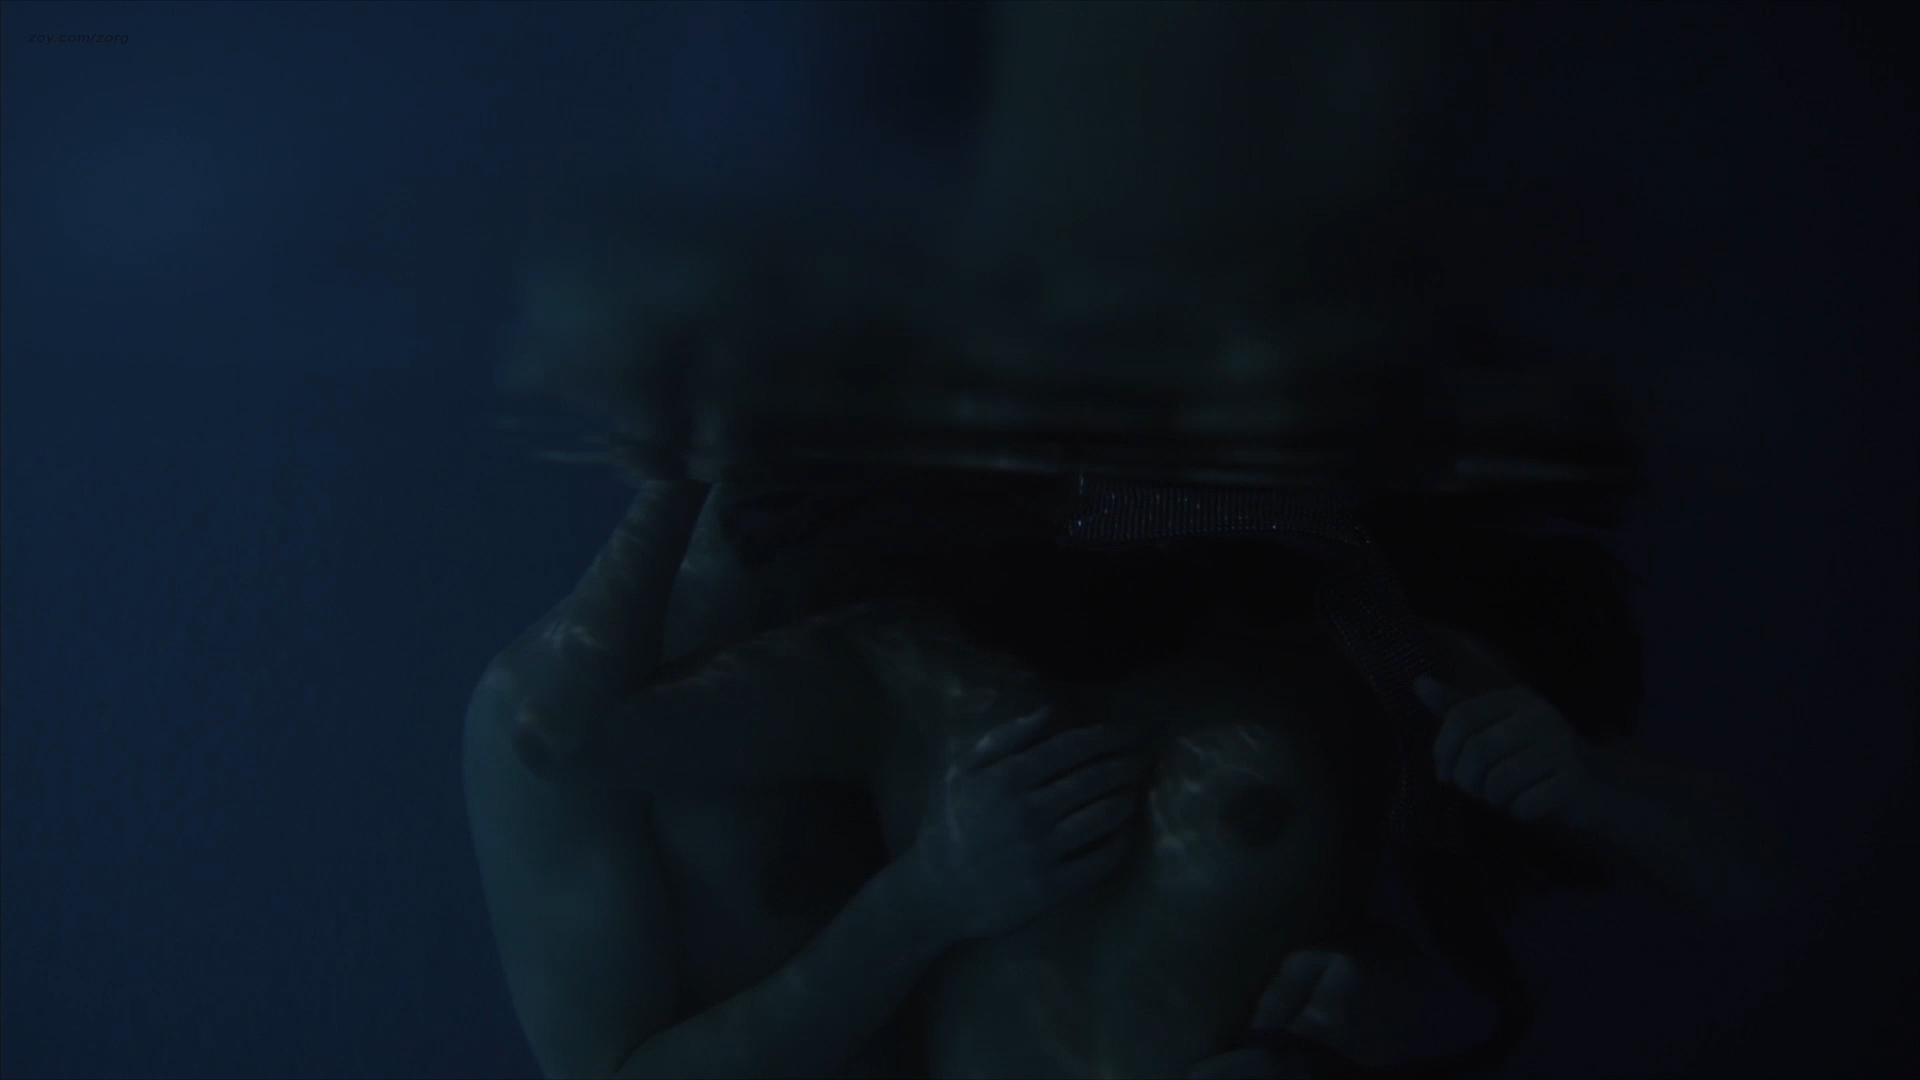 Sadie Katz nude Roxanne Pallett nude sex and others nude - Wrong Turn 6 Last_Resort (2014) hd1080p (4)